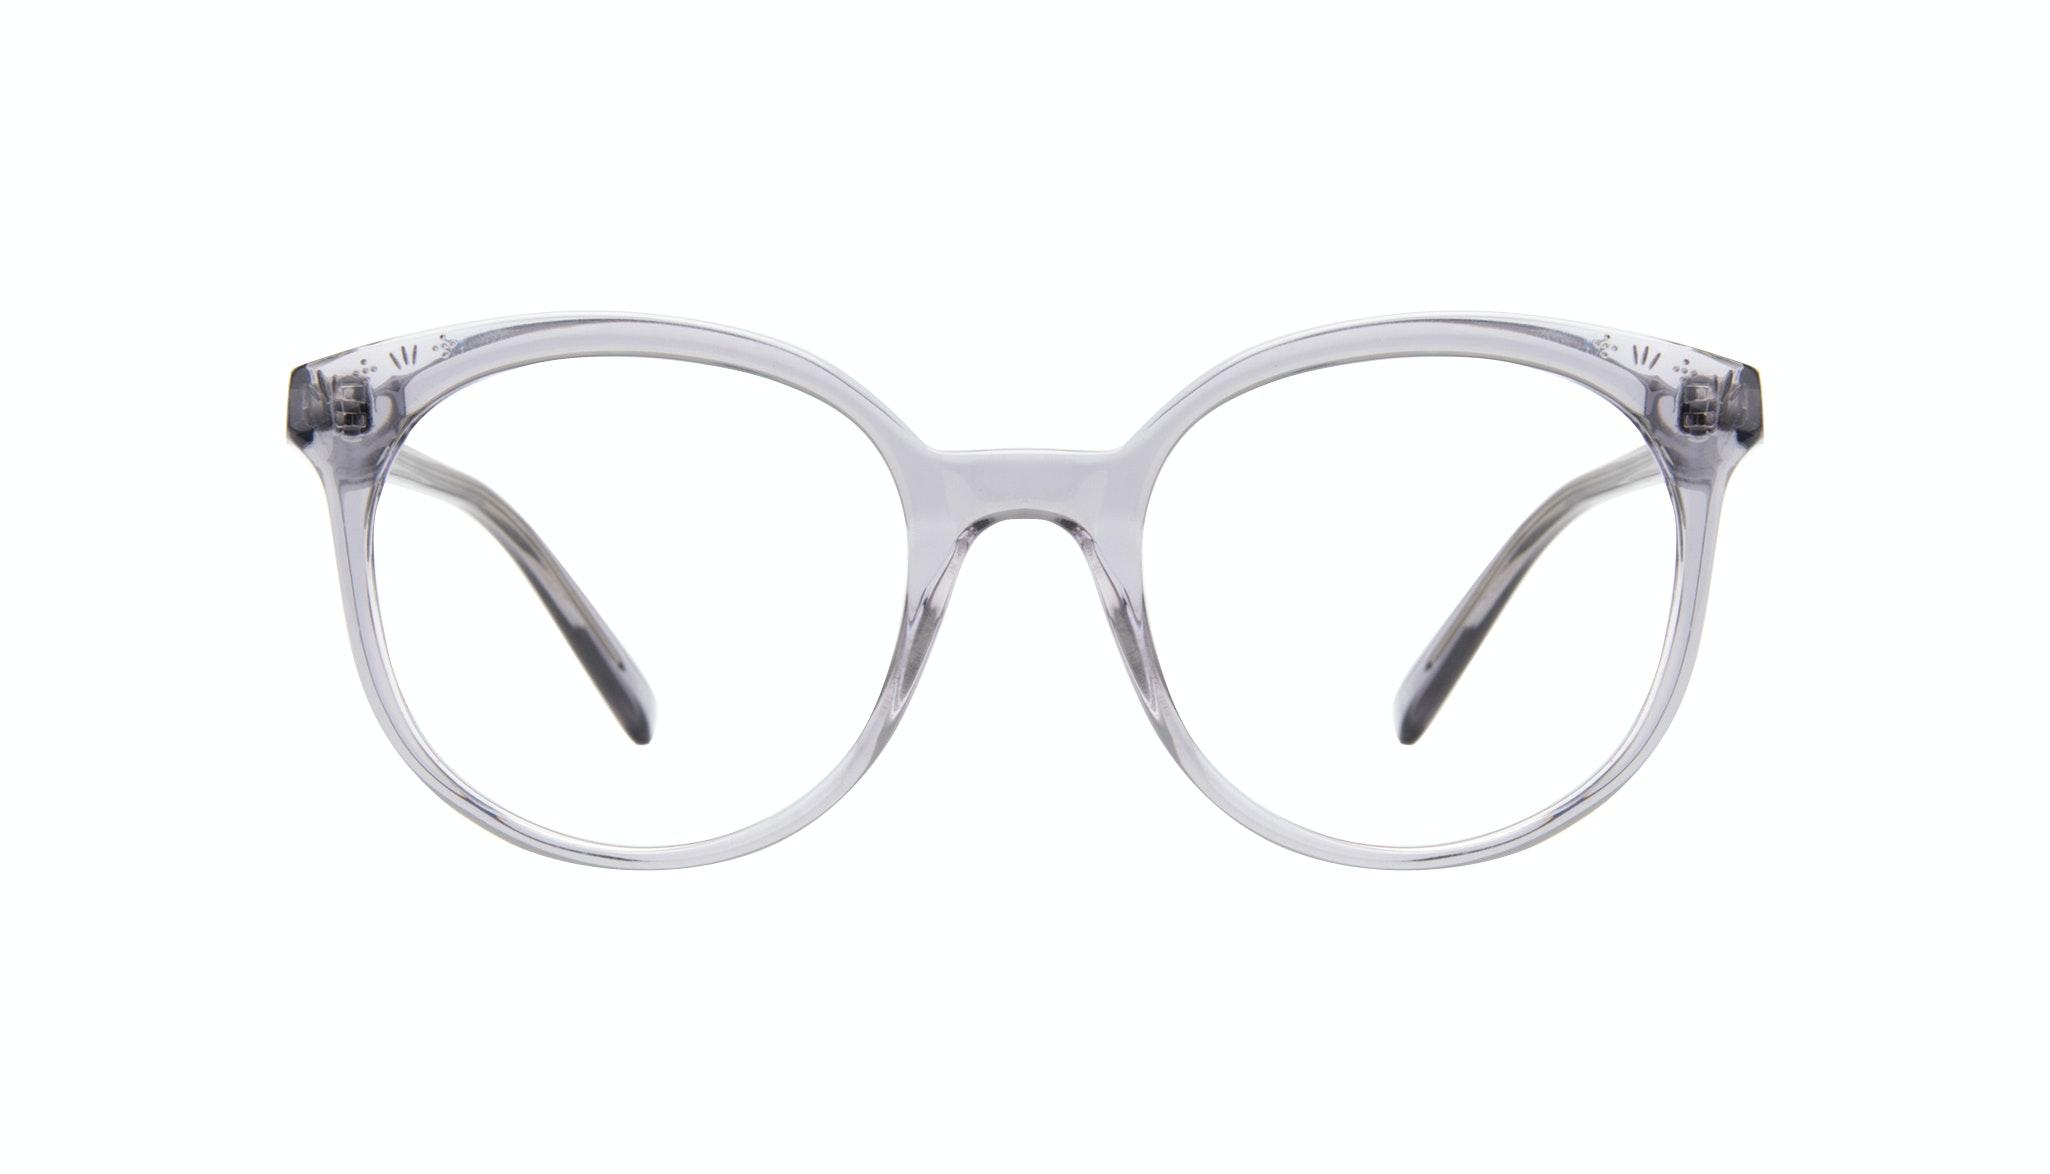 Affordable Fashion Glasses Round Eyeglasses Women Must Grey